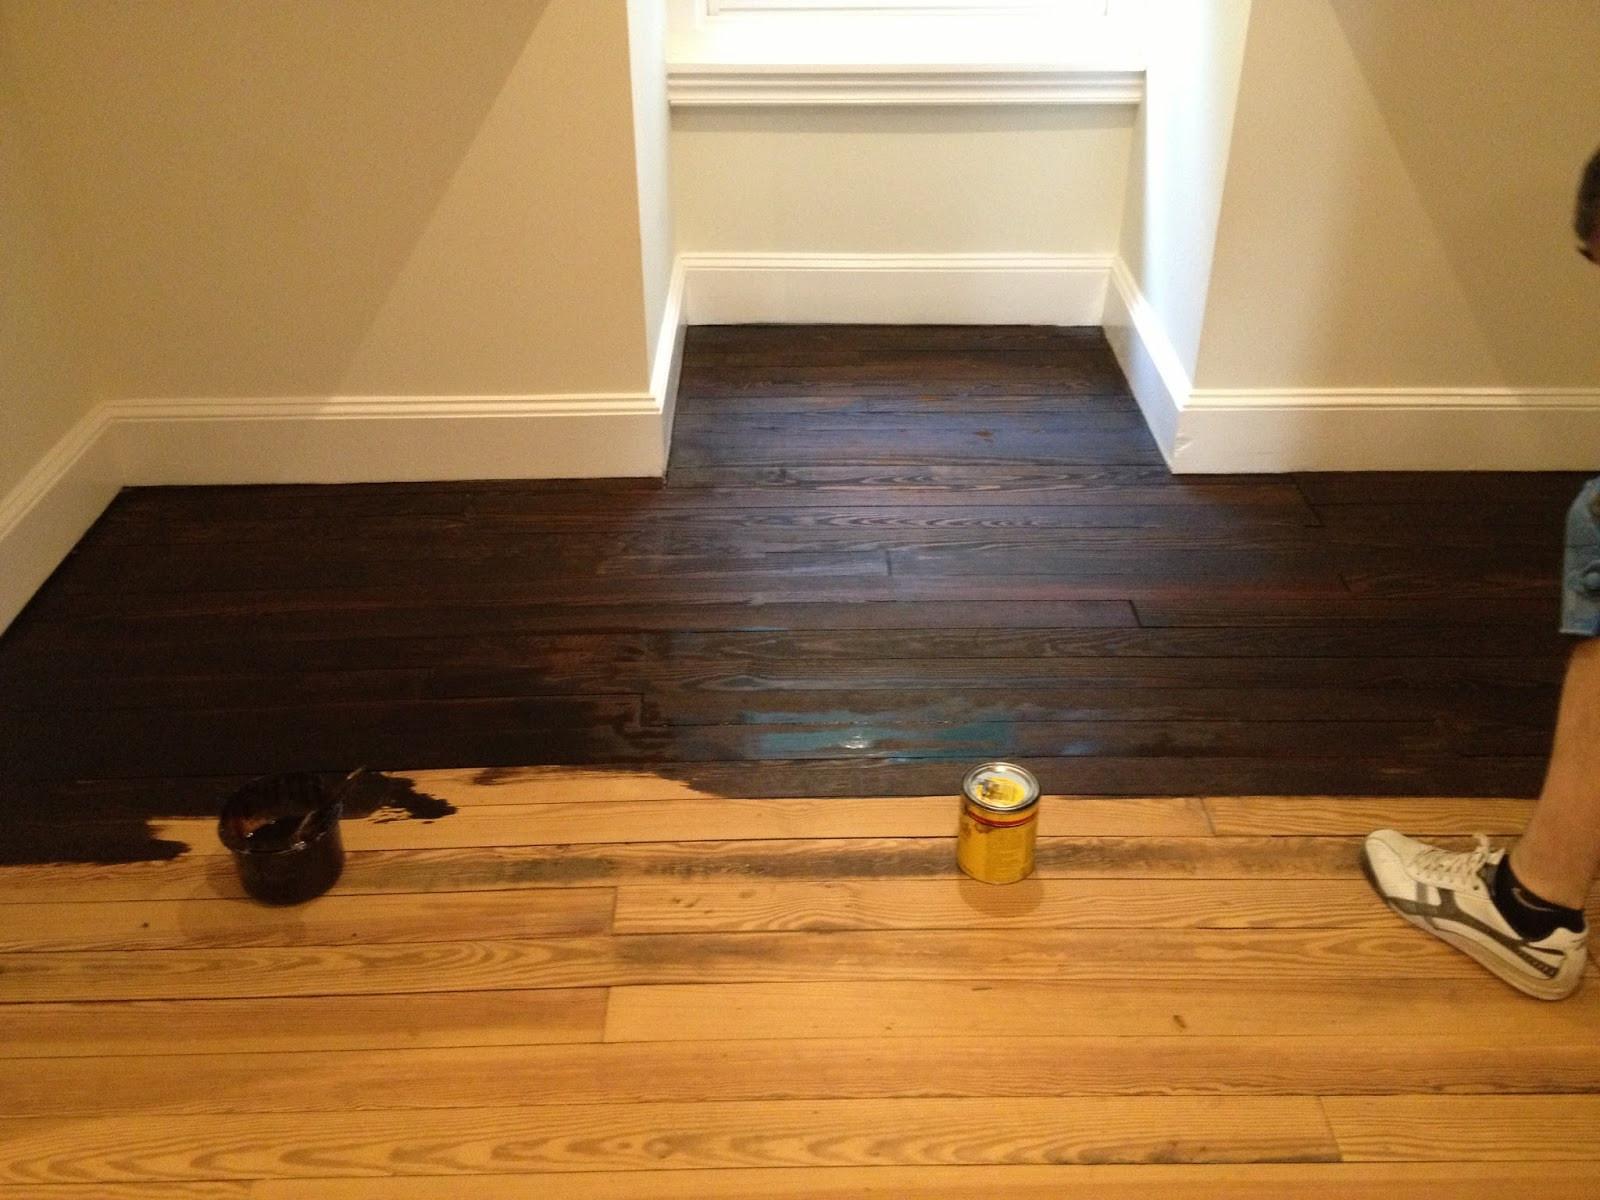 Best ideas about DIY Refinish Wood Floor . Save or Pin High Street Market 3rd Floor Refinished Hardwood Floor DIY Now.